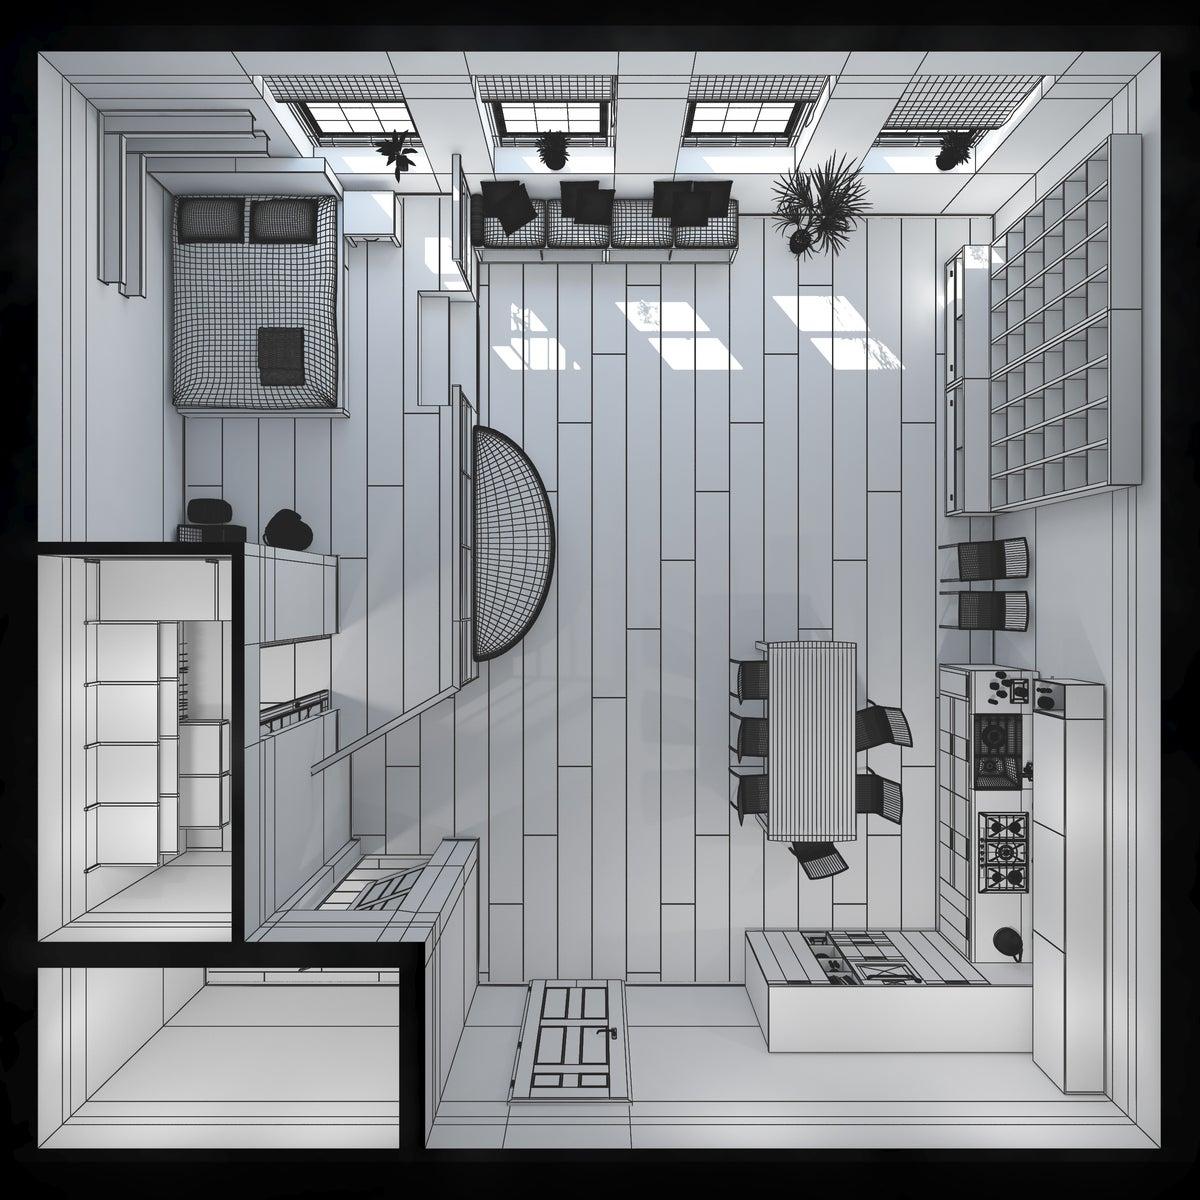 mini-house size